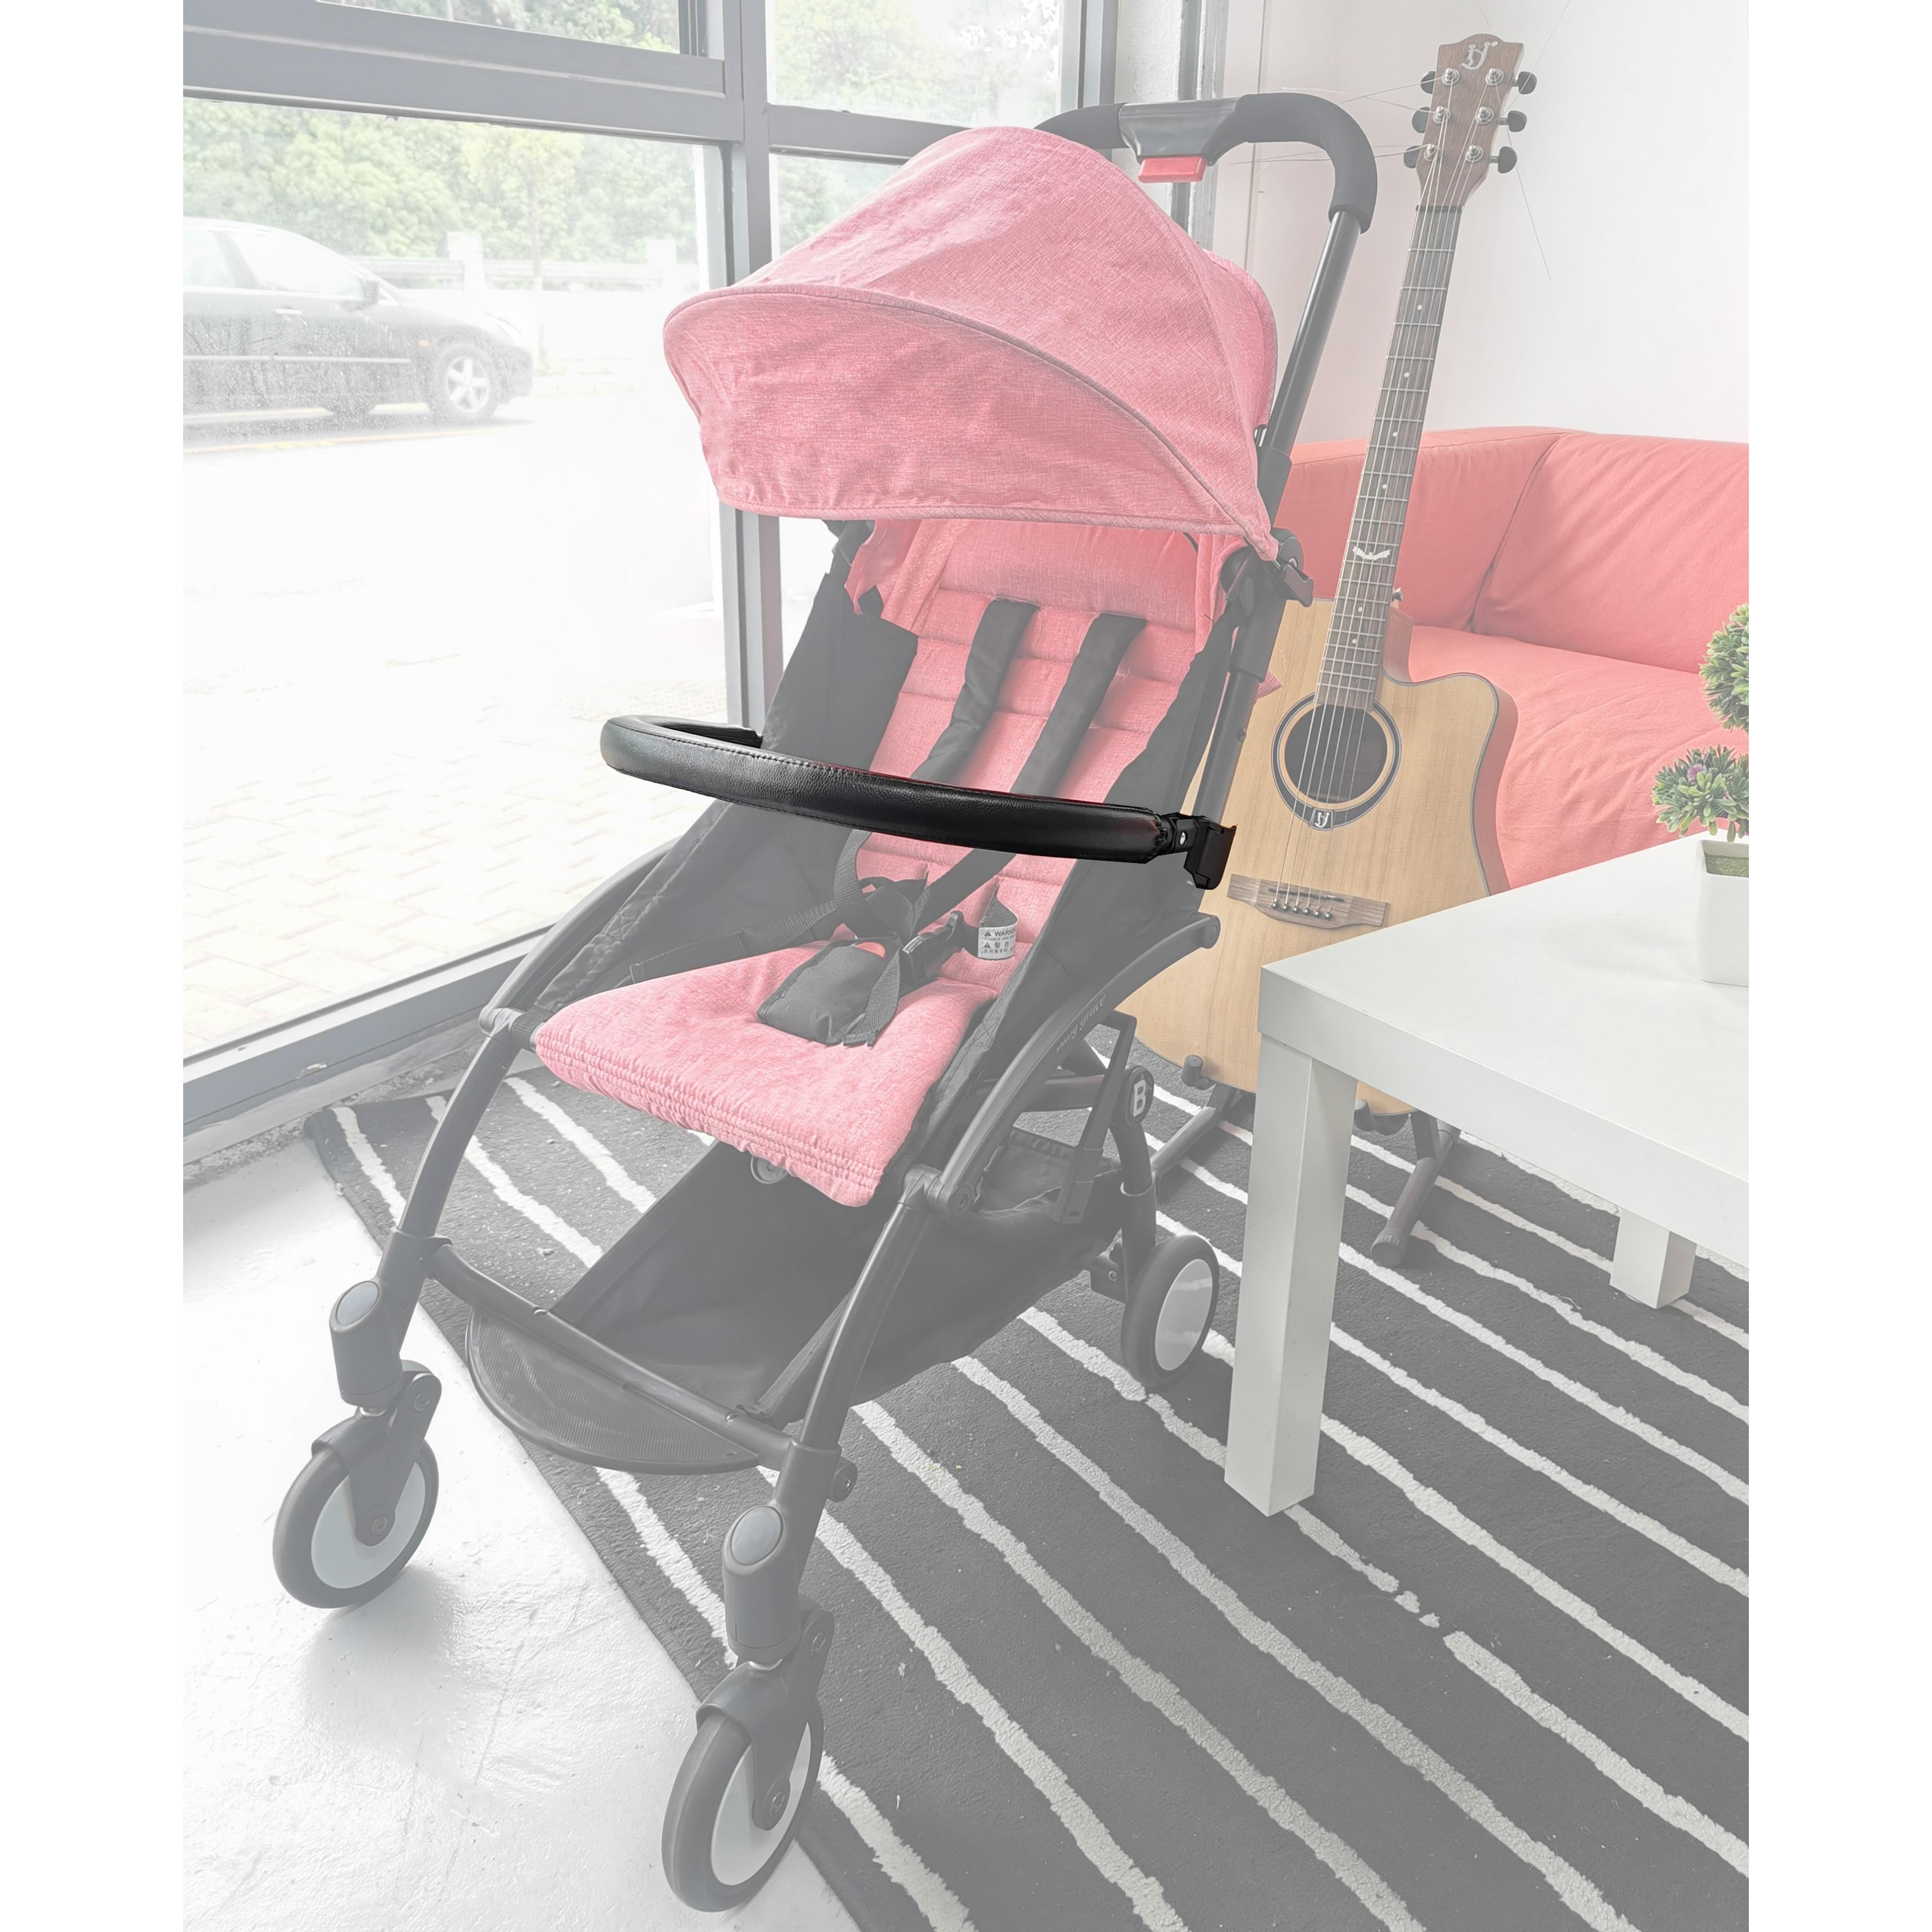 Baby Trolley Armrest Bumper Bar Handlebar Accessories Stroller Pushchair Applied